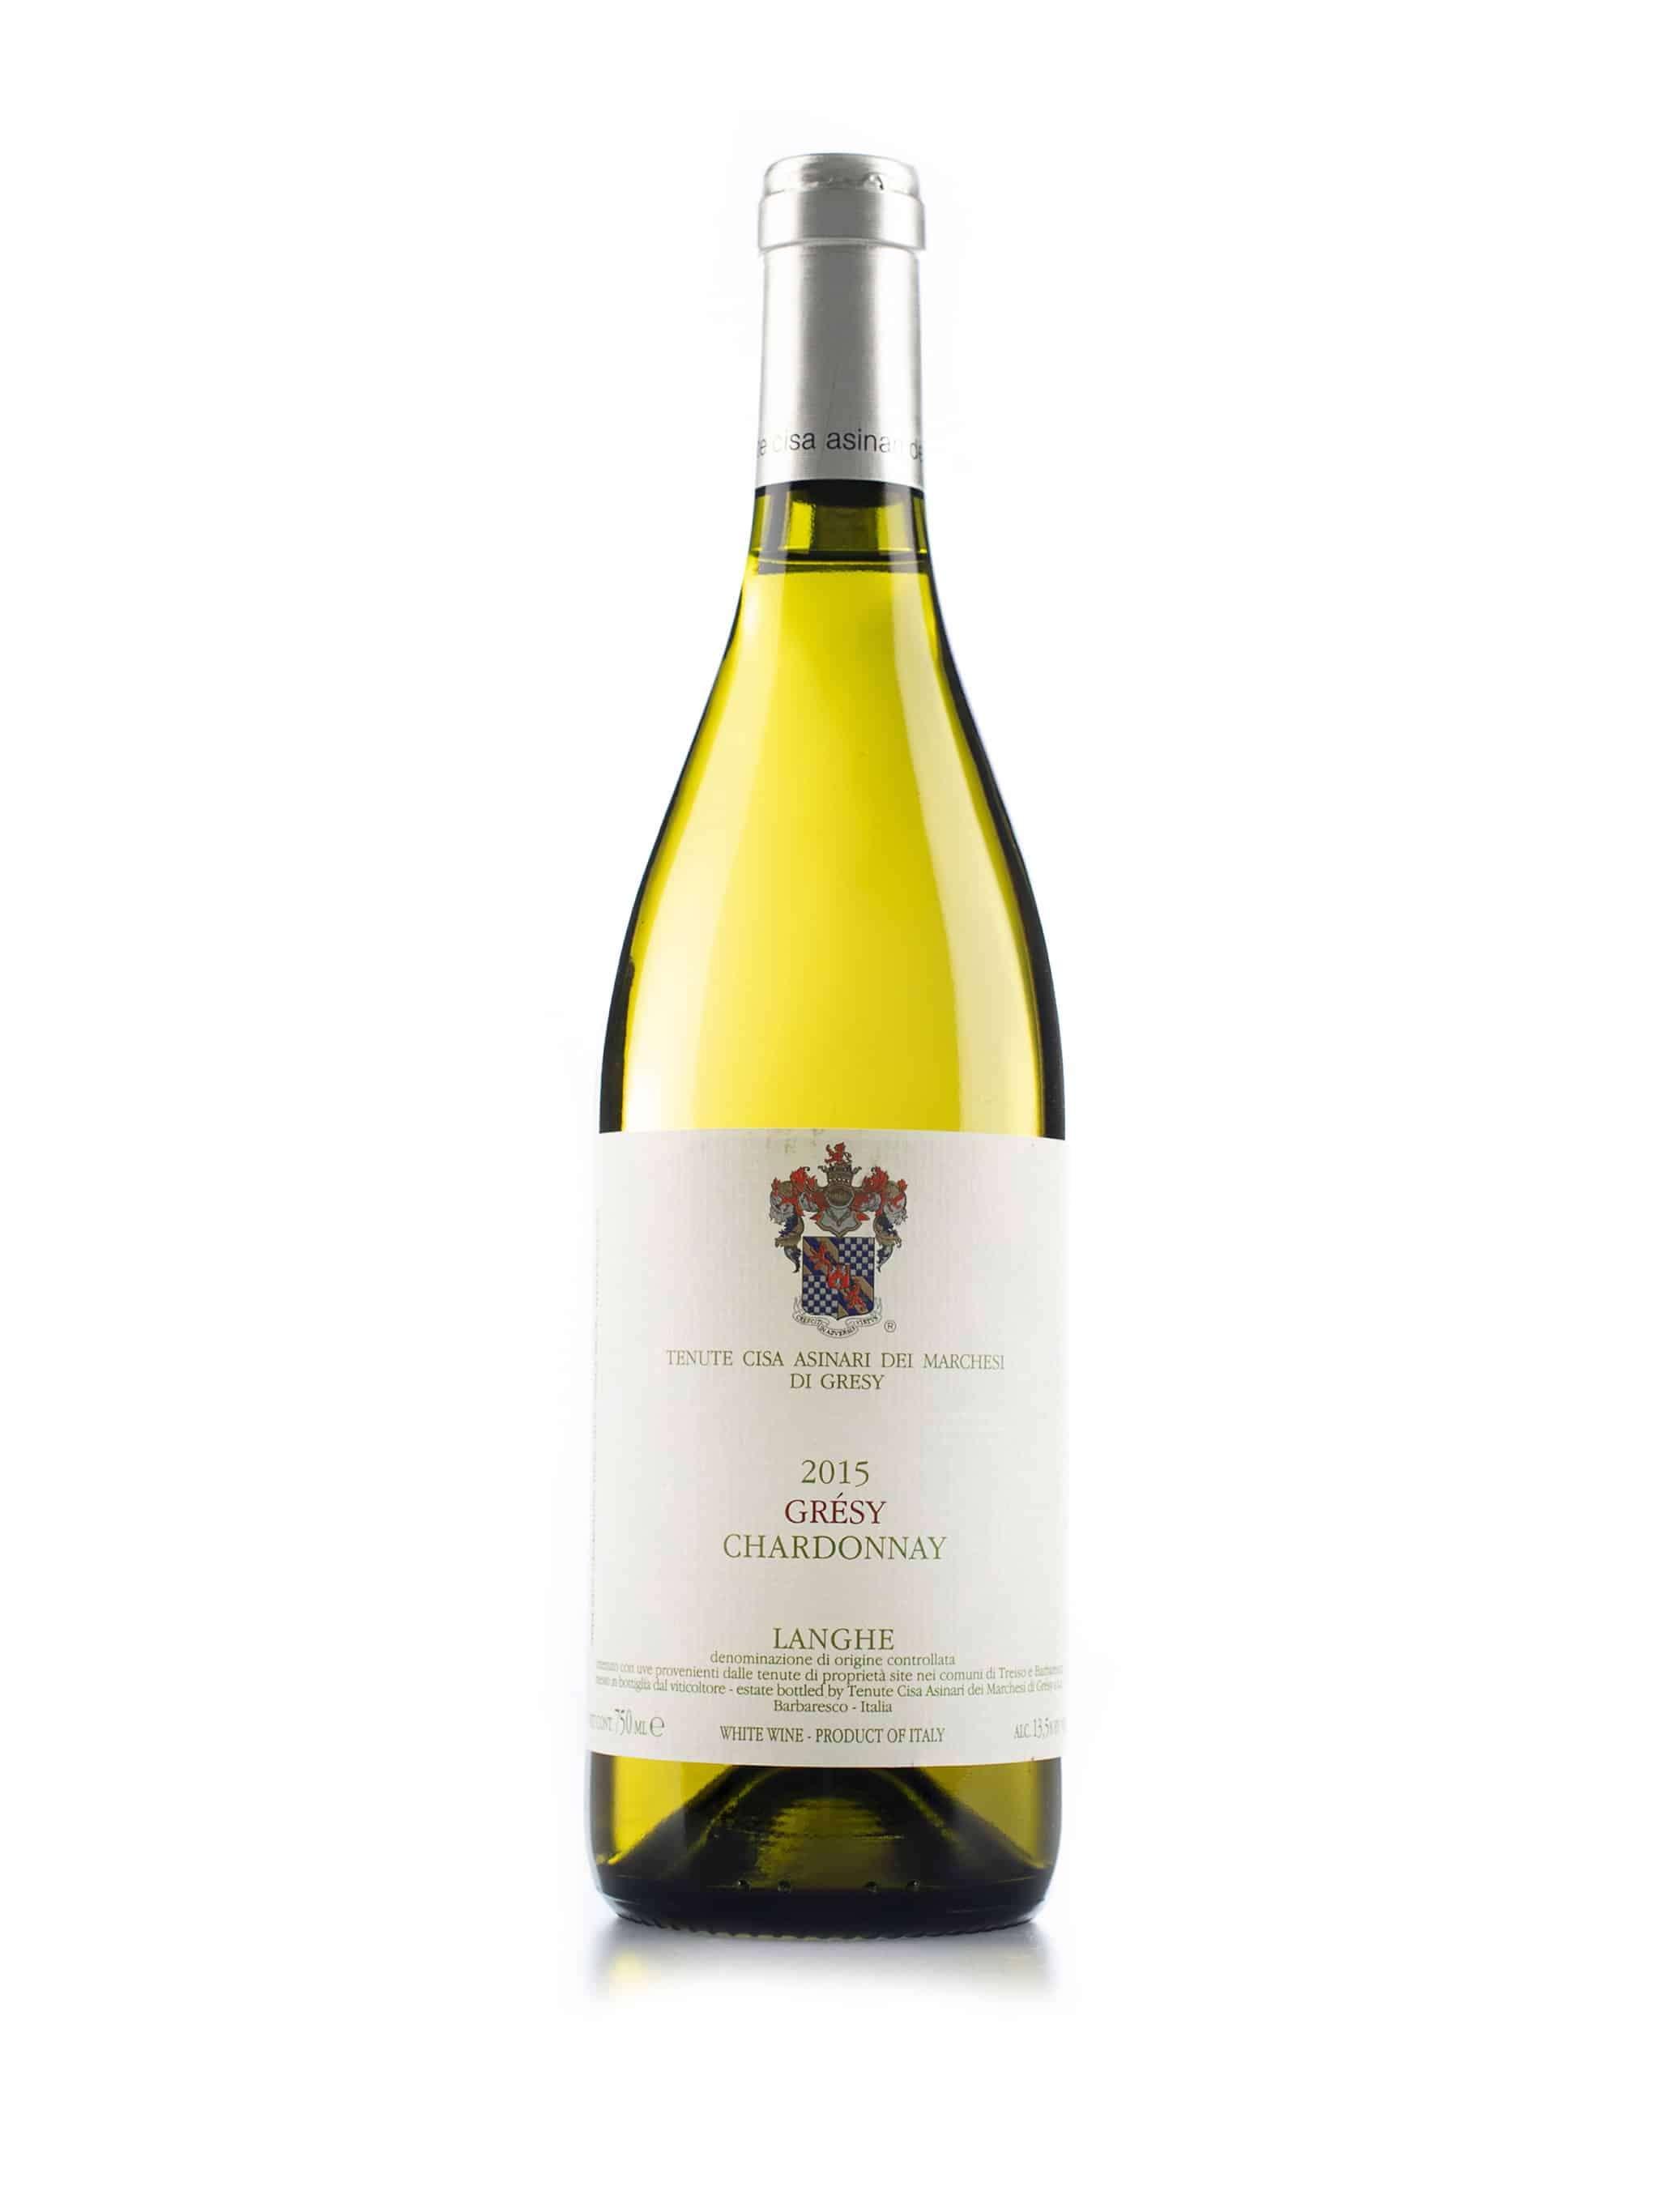 Italiaanse witte wijn van wijndomein Cisa Asinari dei Marchesi di Gresy: Chardonnay Gresy